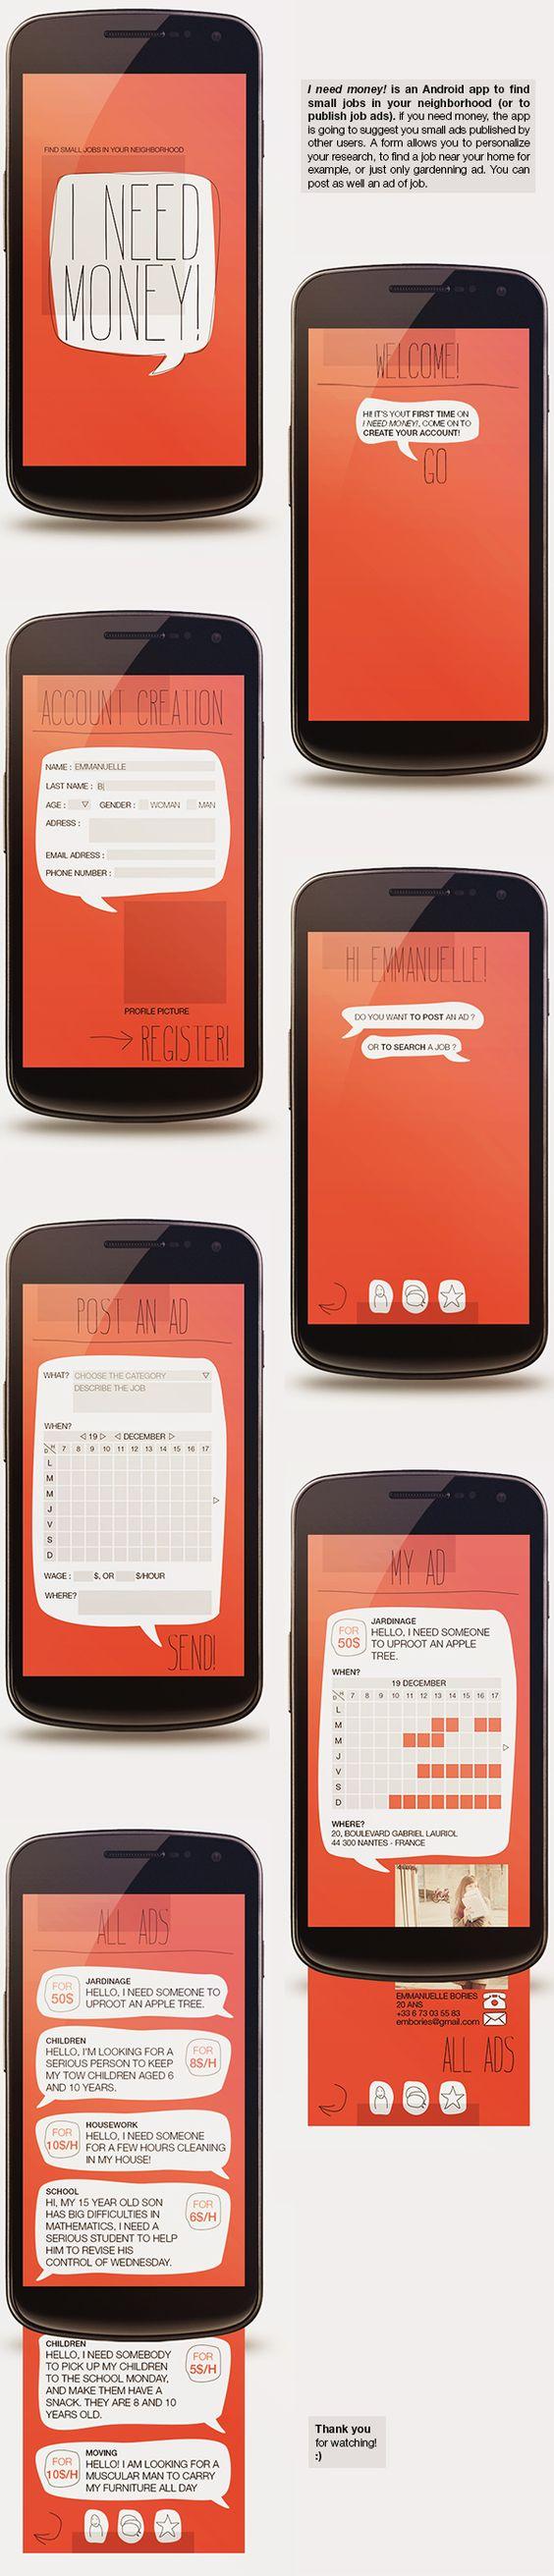 I need money! - Android app concept | Designer: Emmanuelle Bories | Project: http://www.behance.net/gallery/I-need-money-Android-app-2013/7597445